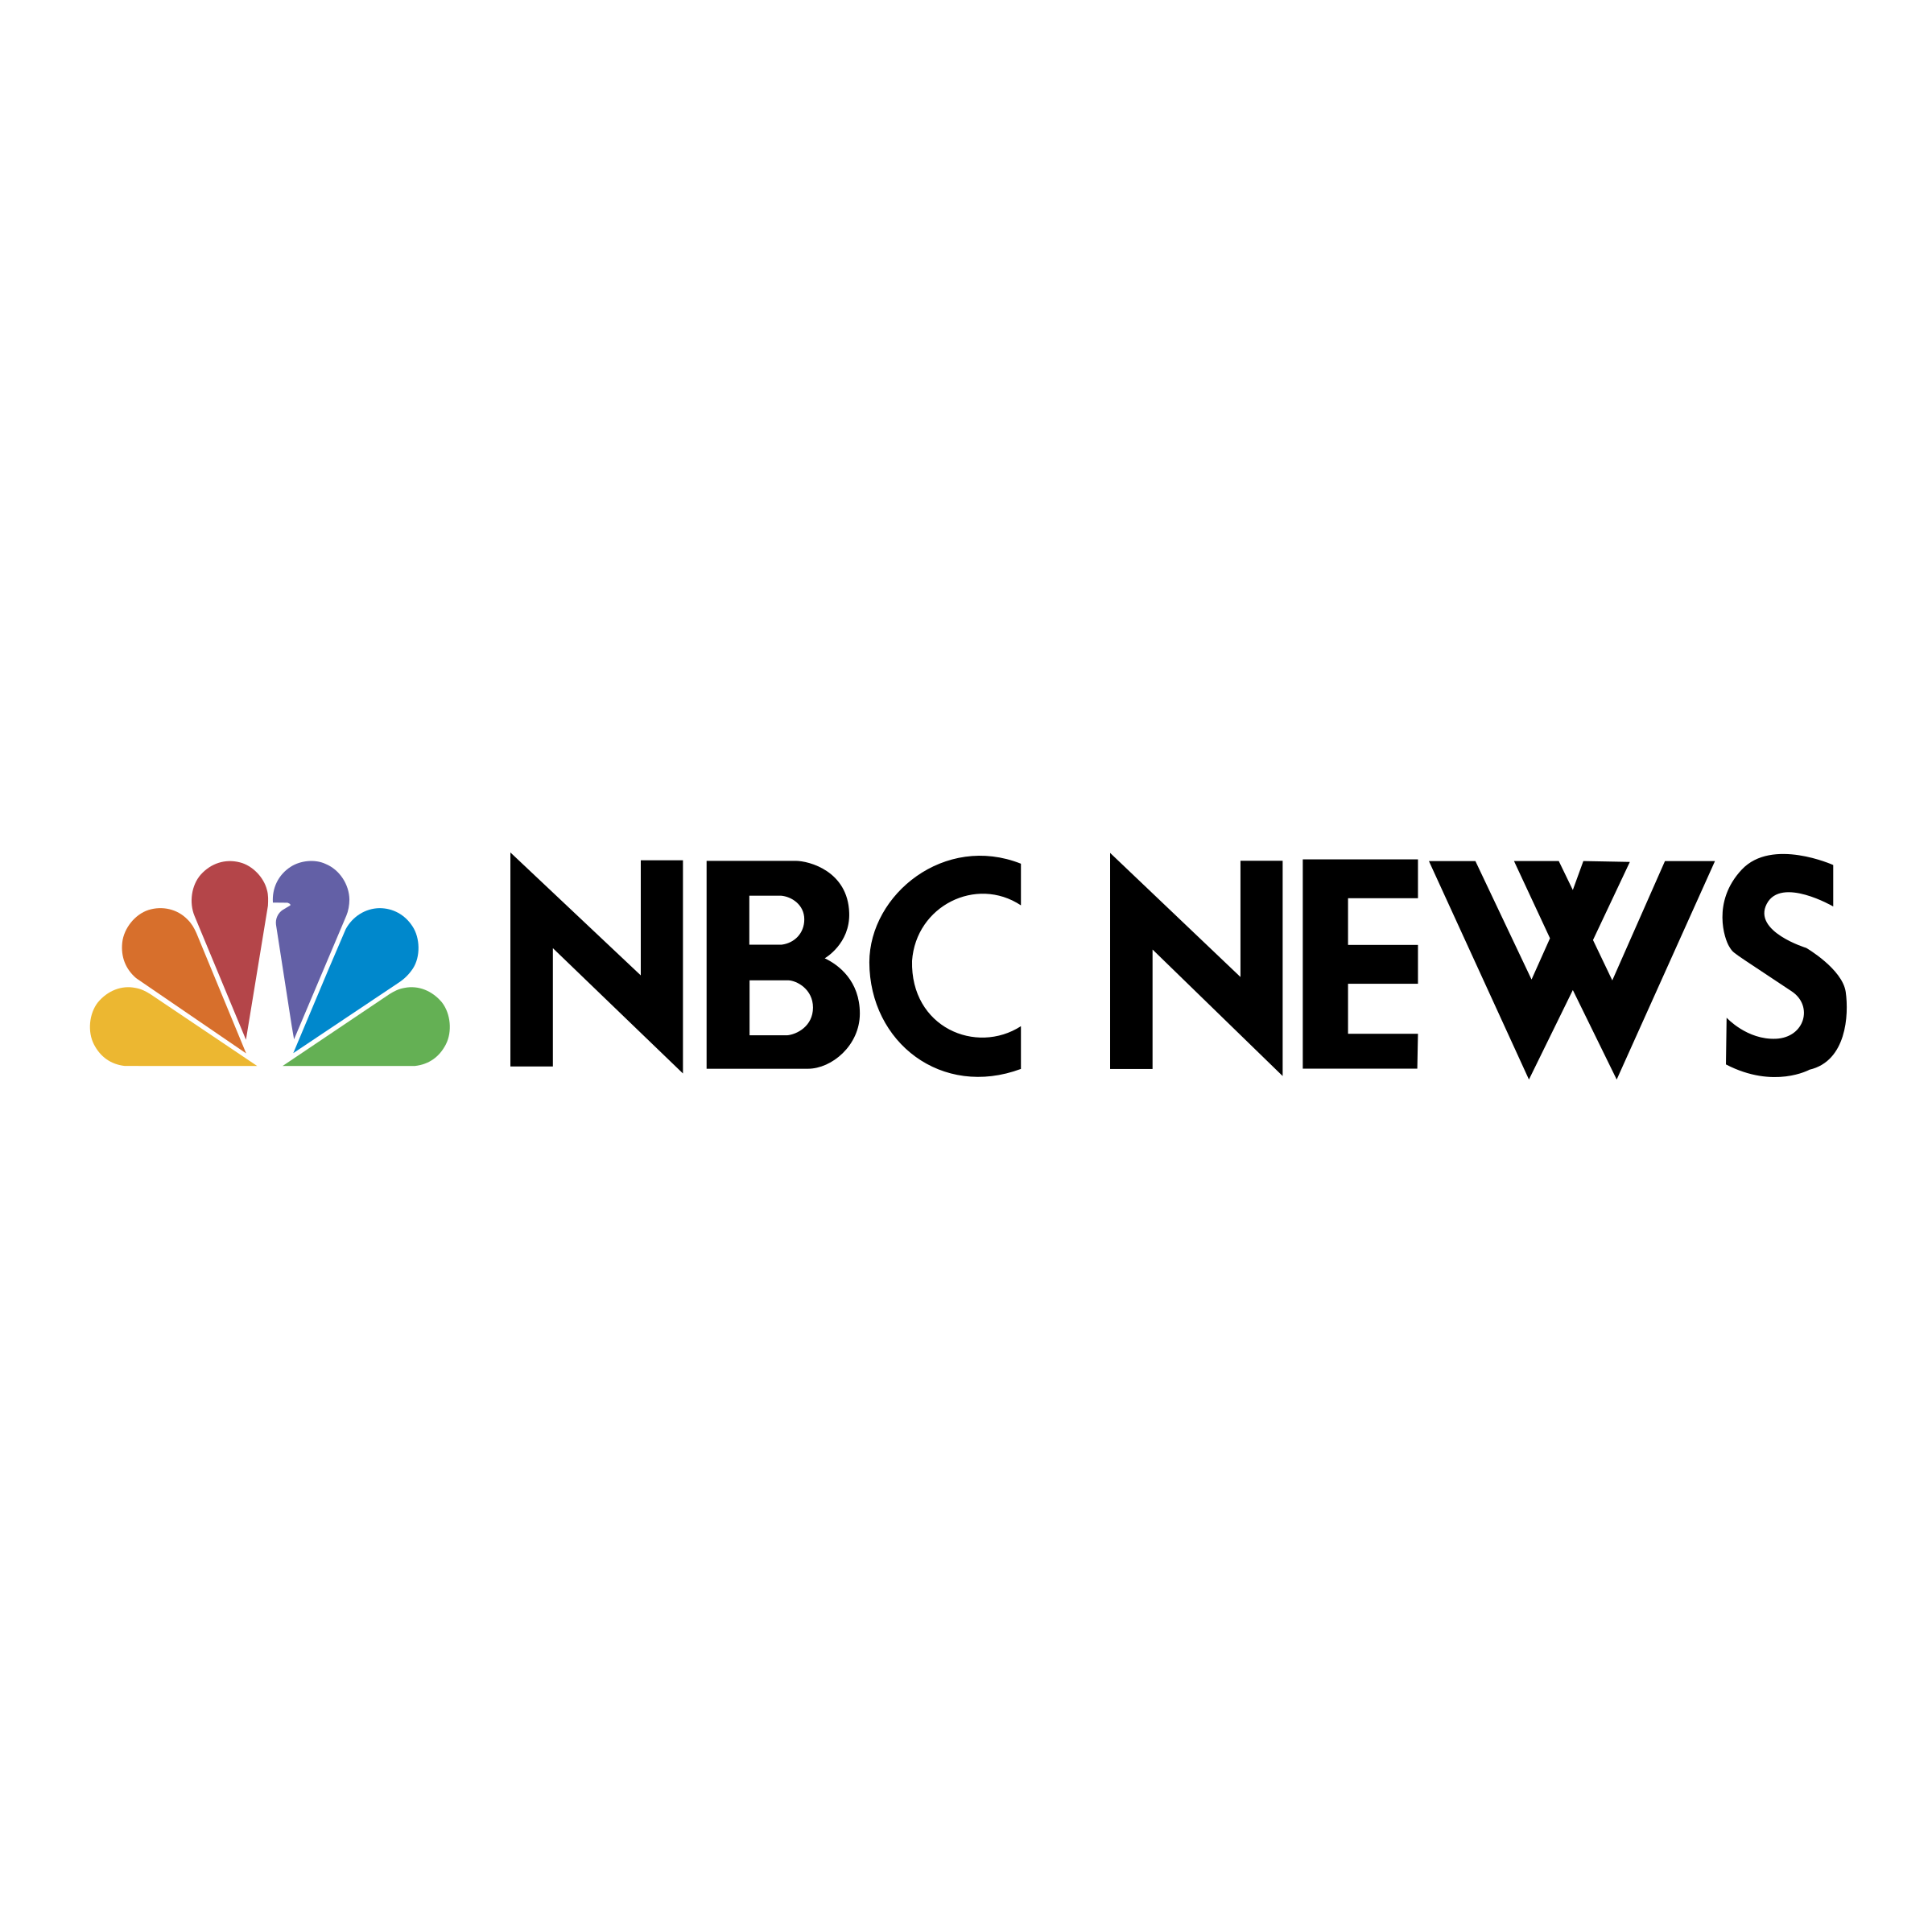 nbc-news-logo-png-transparent